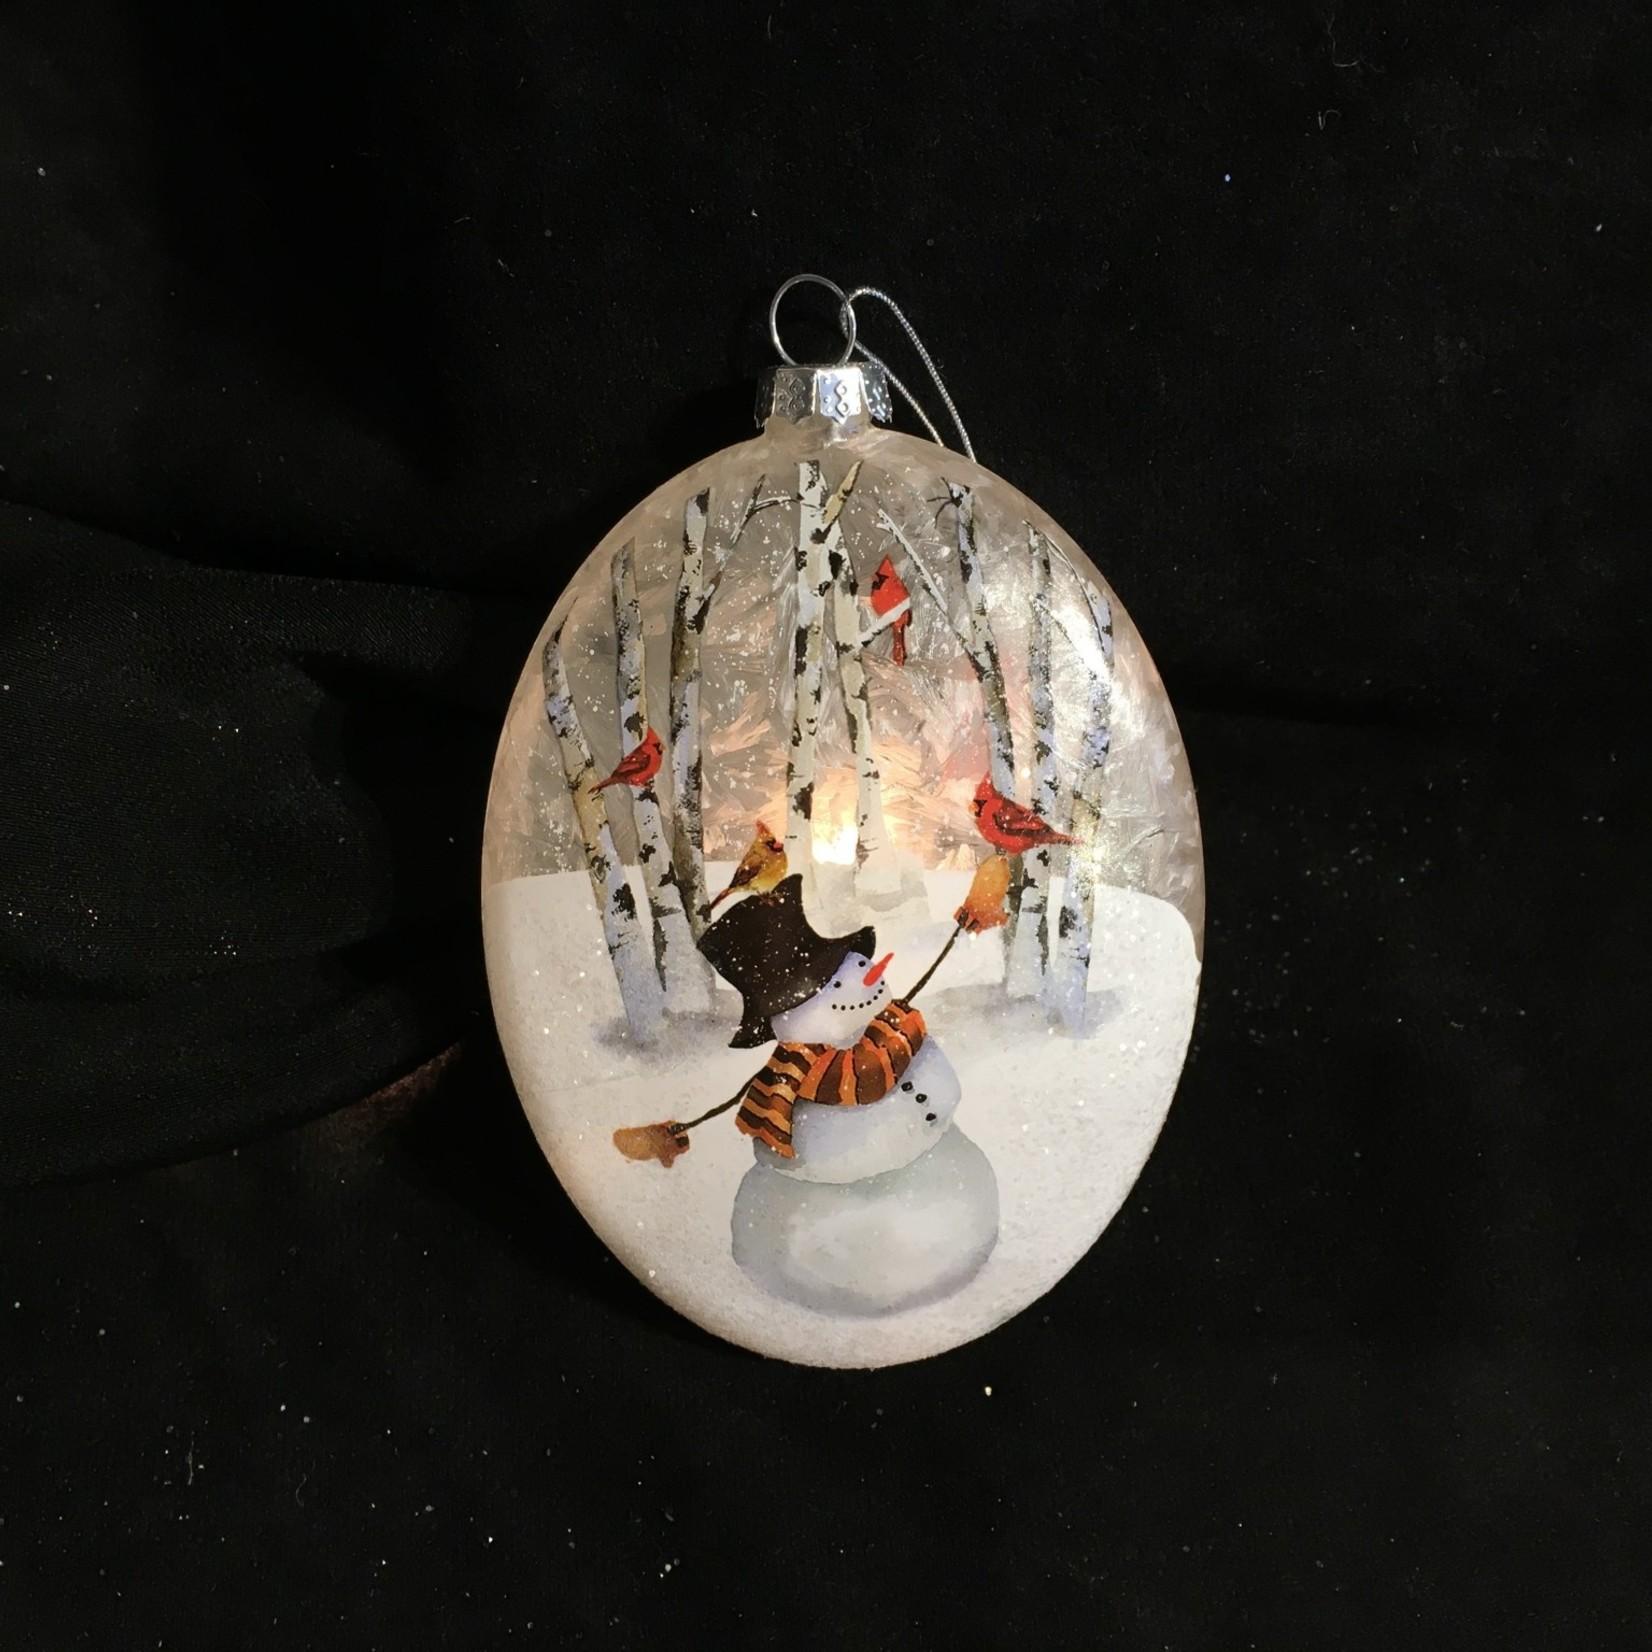 "**5.5"" Oval Lit Snowman Ornament 2A"